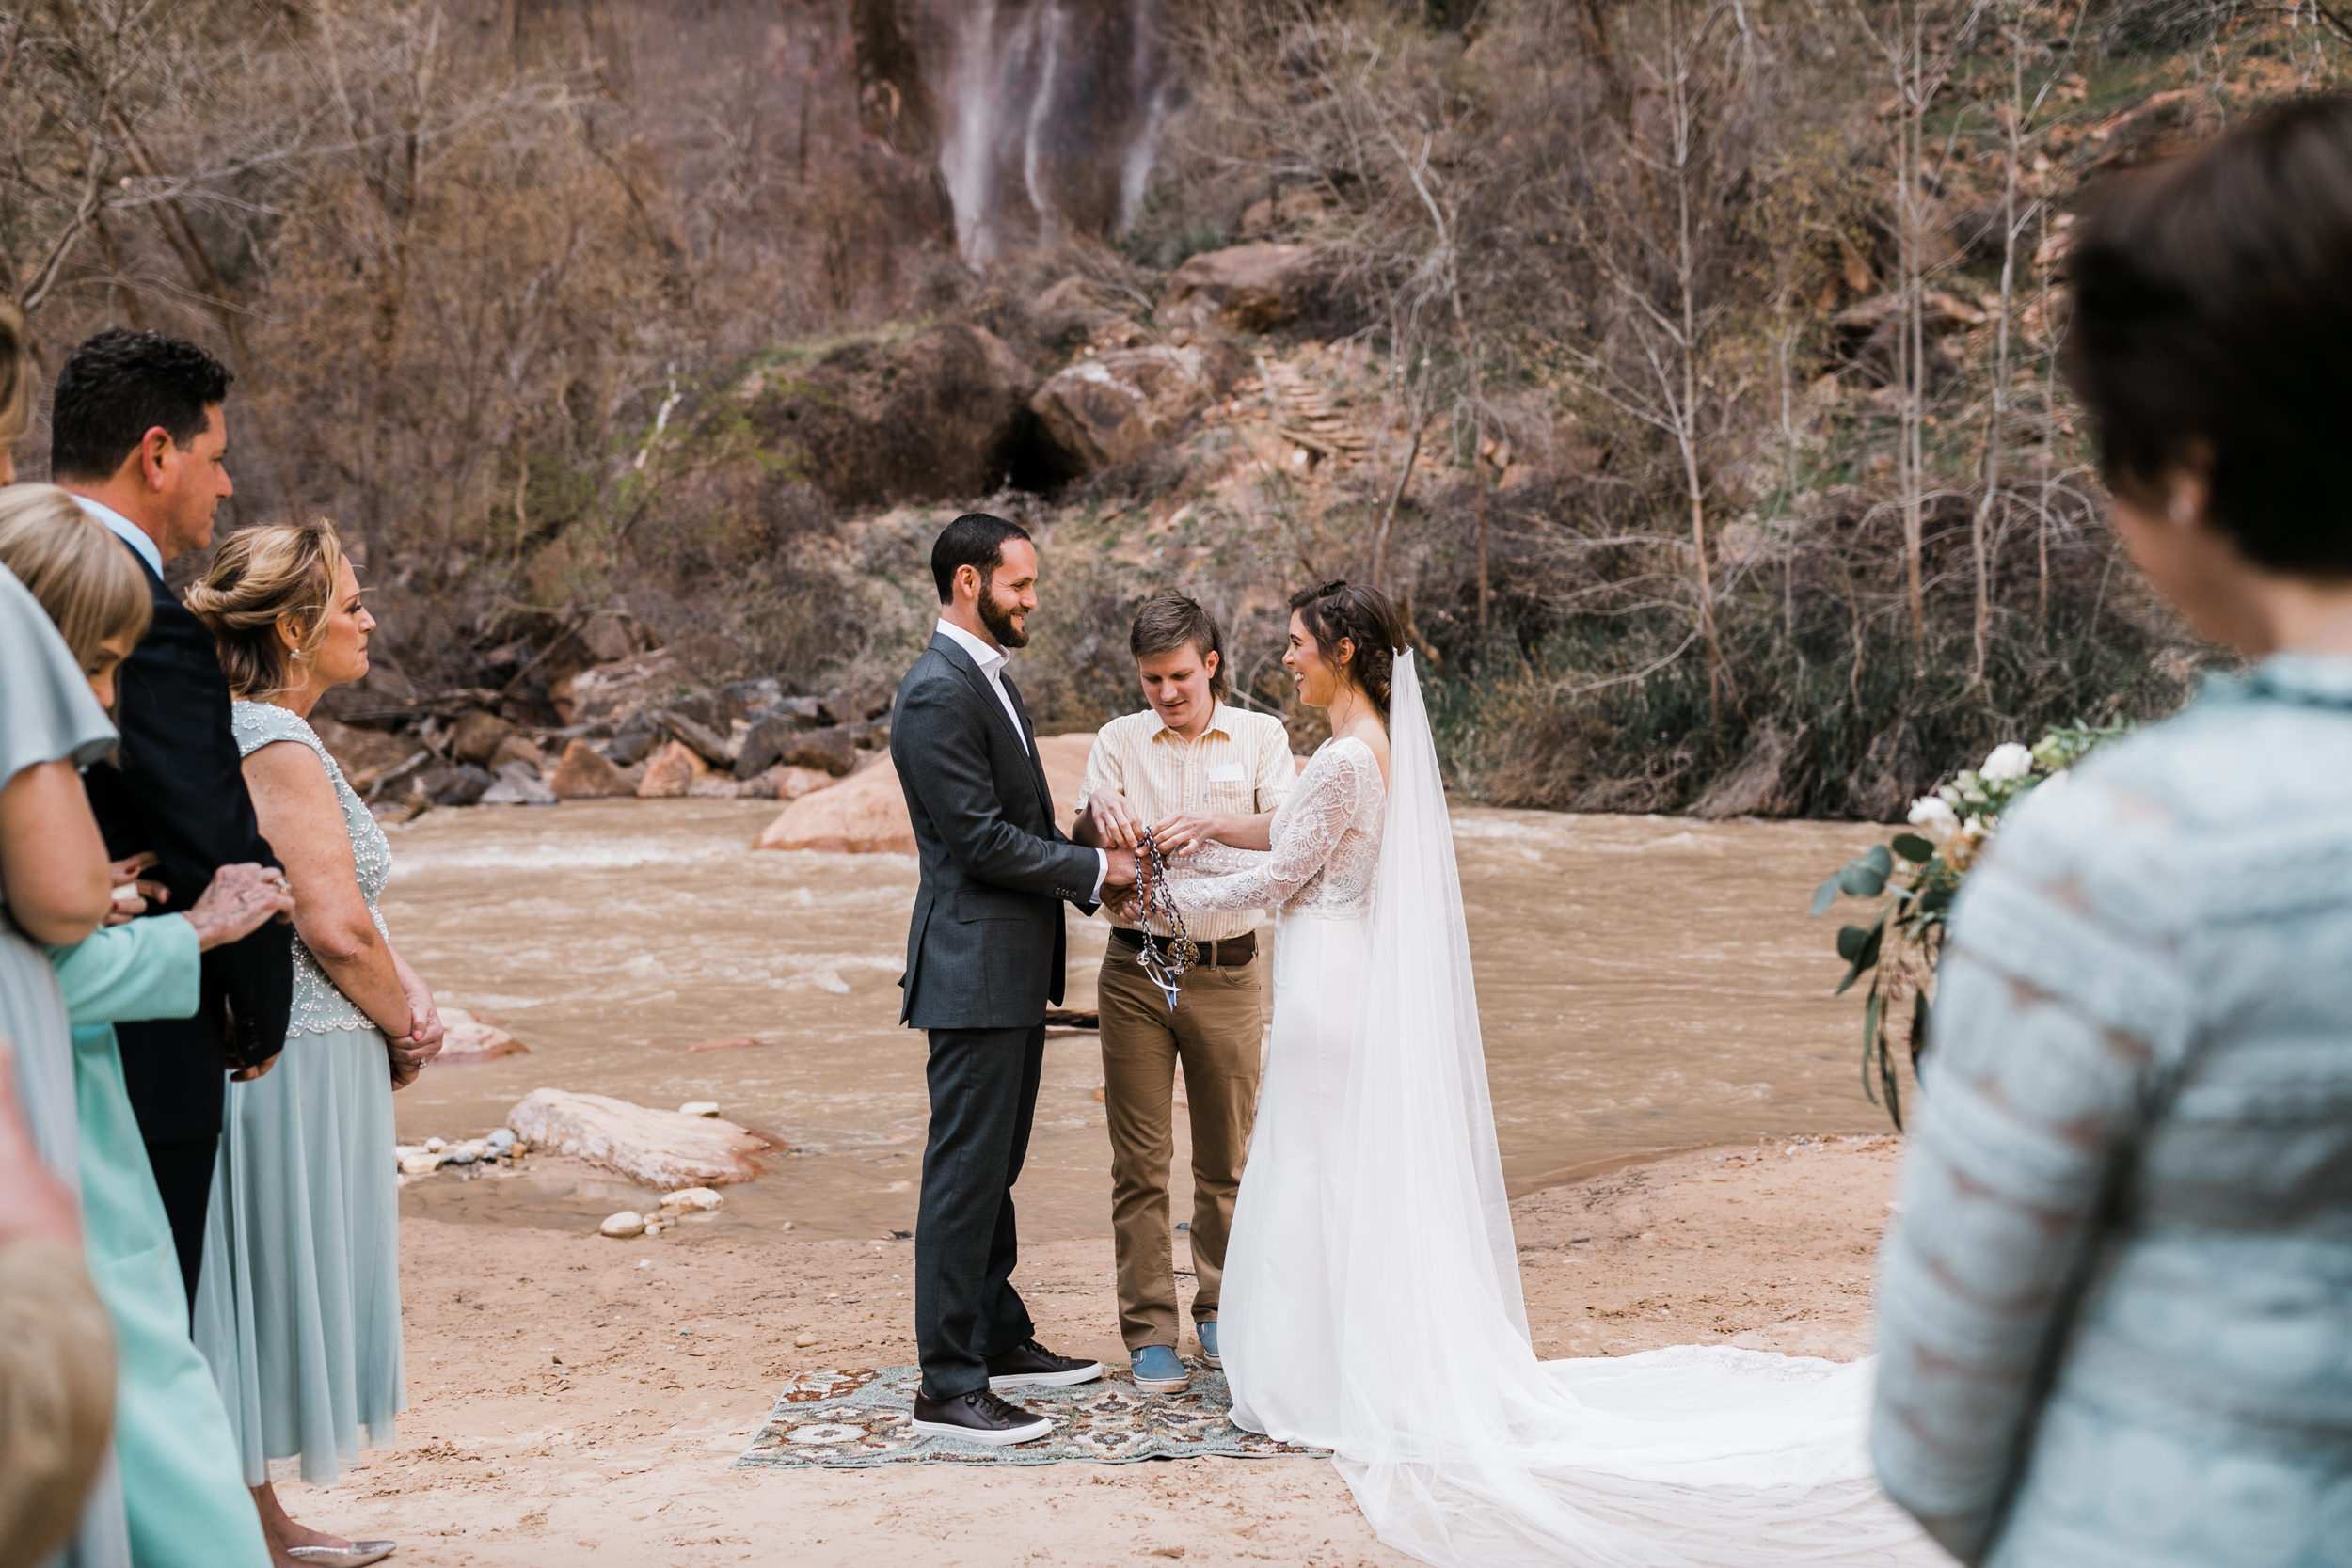 Zion-National-Park-Adventure-Wedding-Hearnes-Elopement-Photography-9.jpg